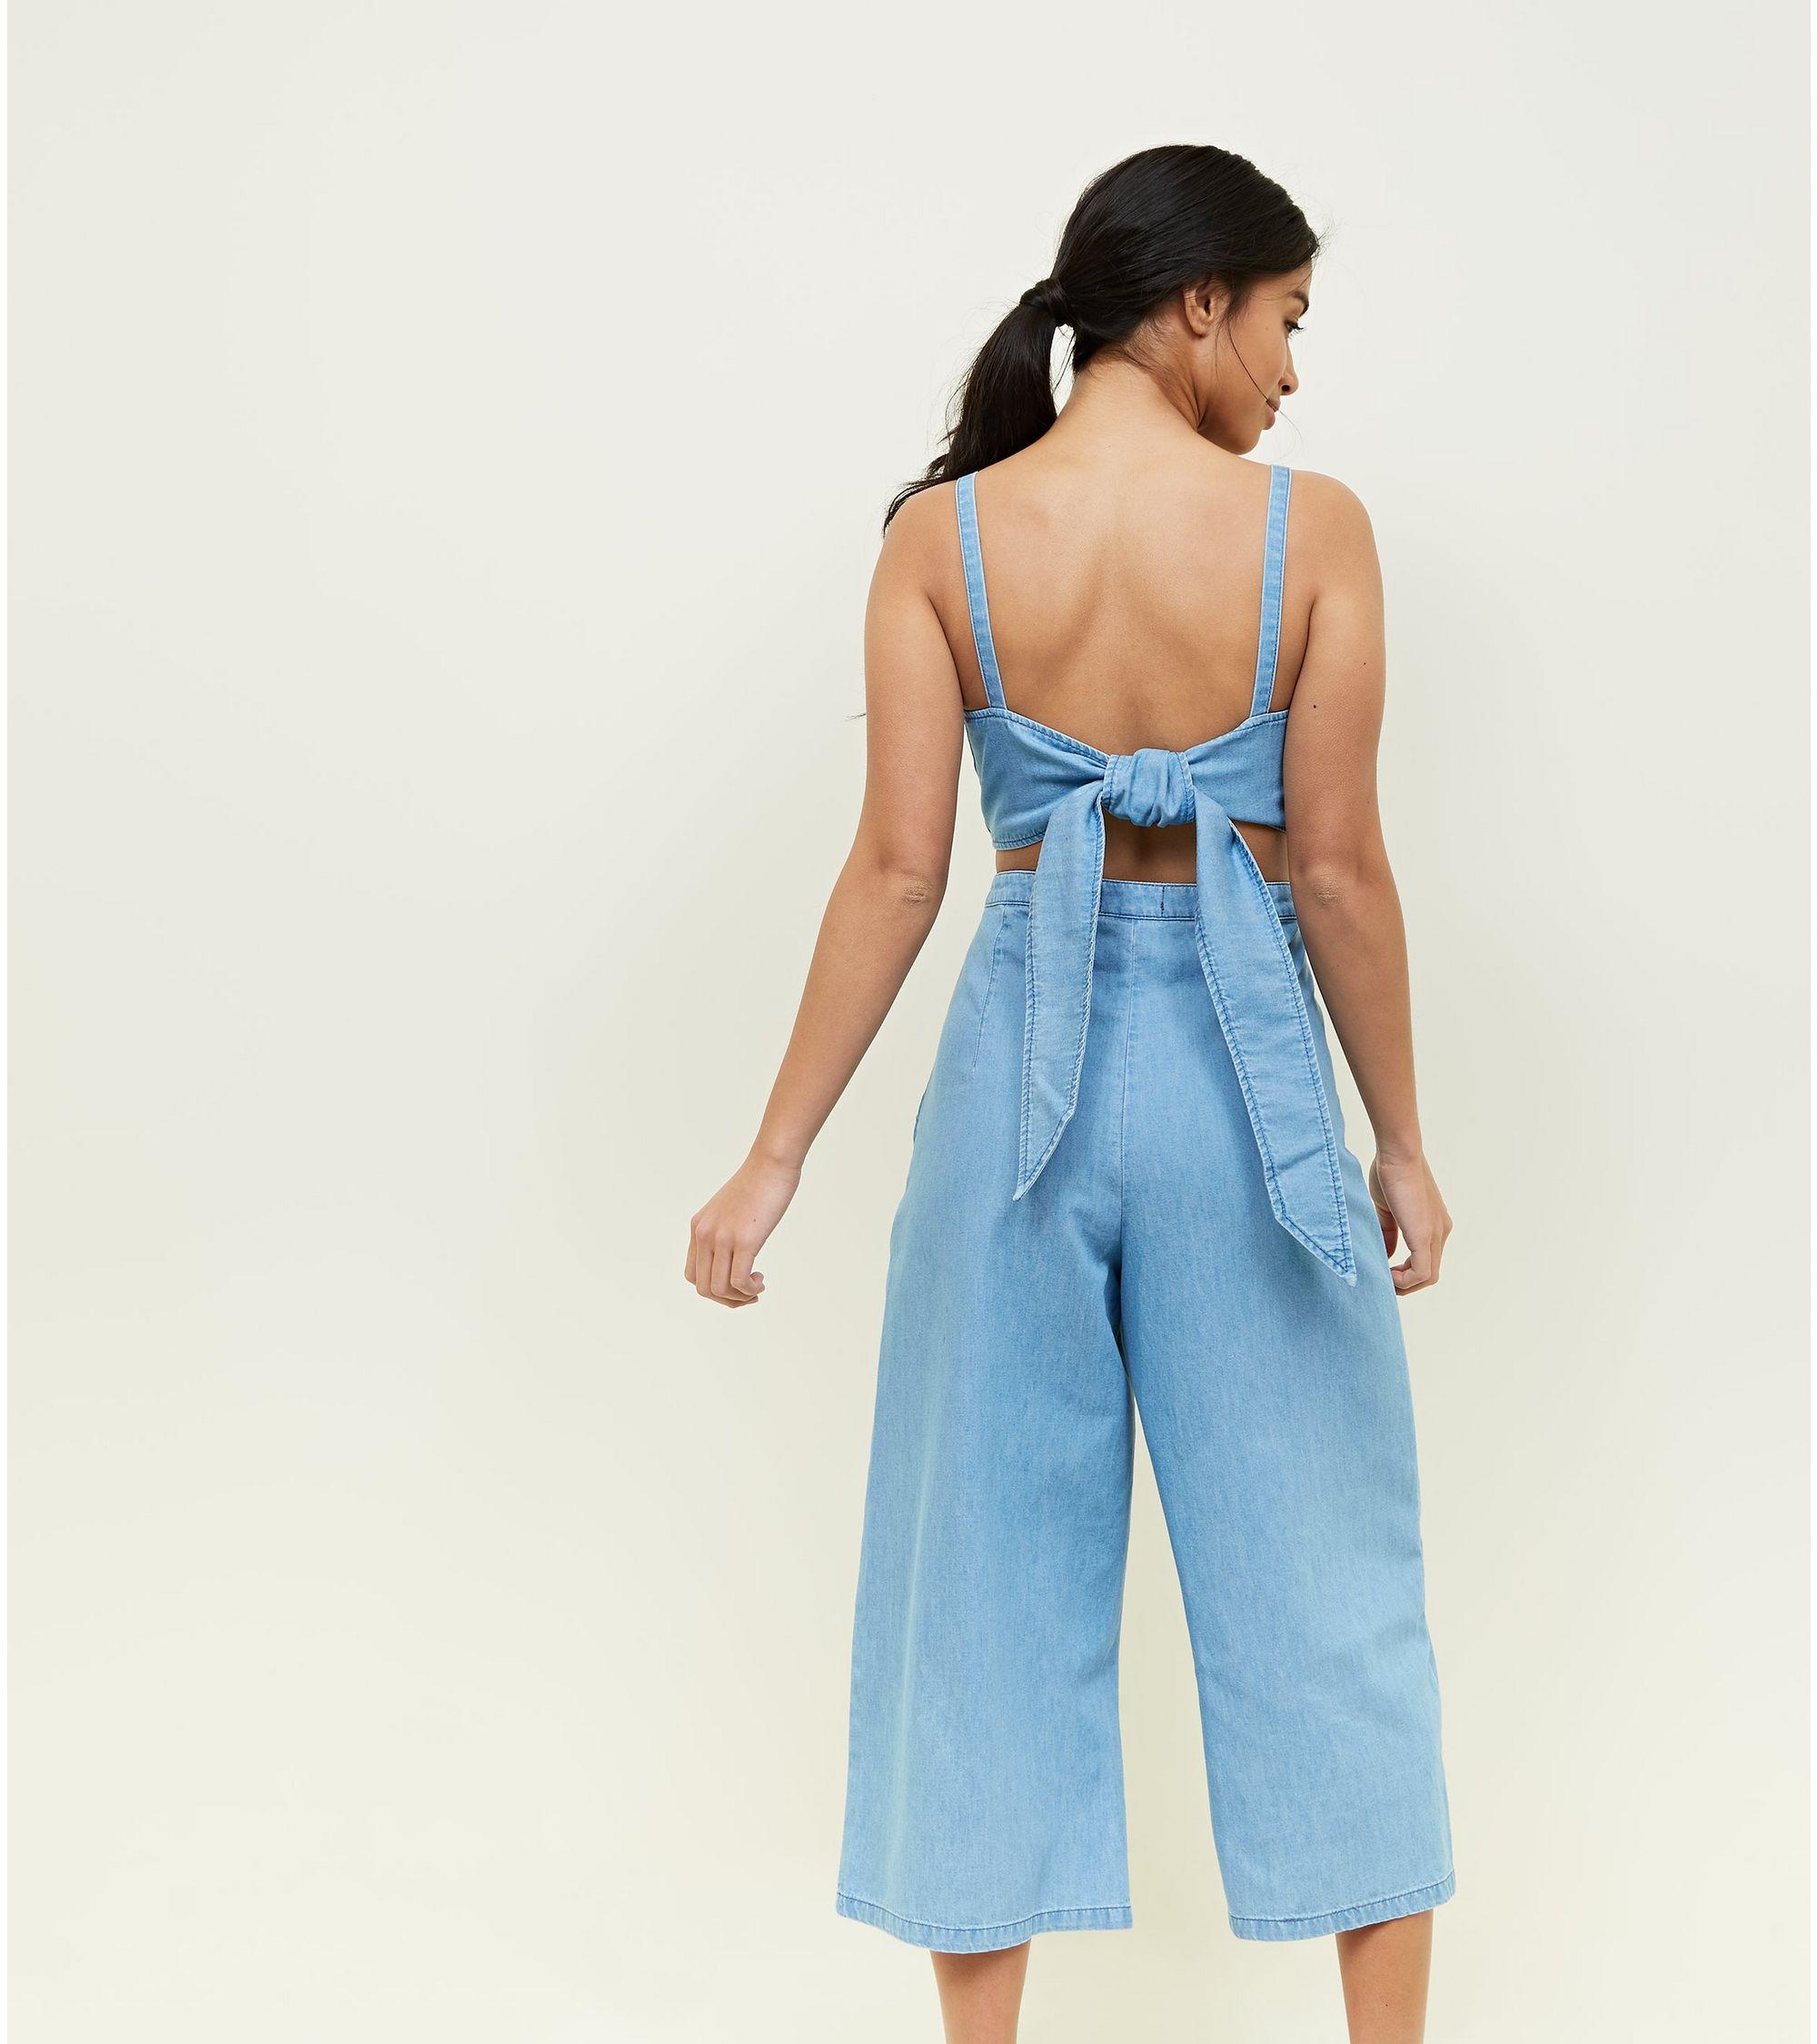 ff3d8b43428 New Look Petite Blue Tie Back Lightweight Denim Jumpsuit at £10 ...